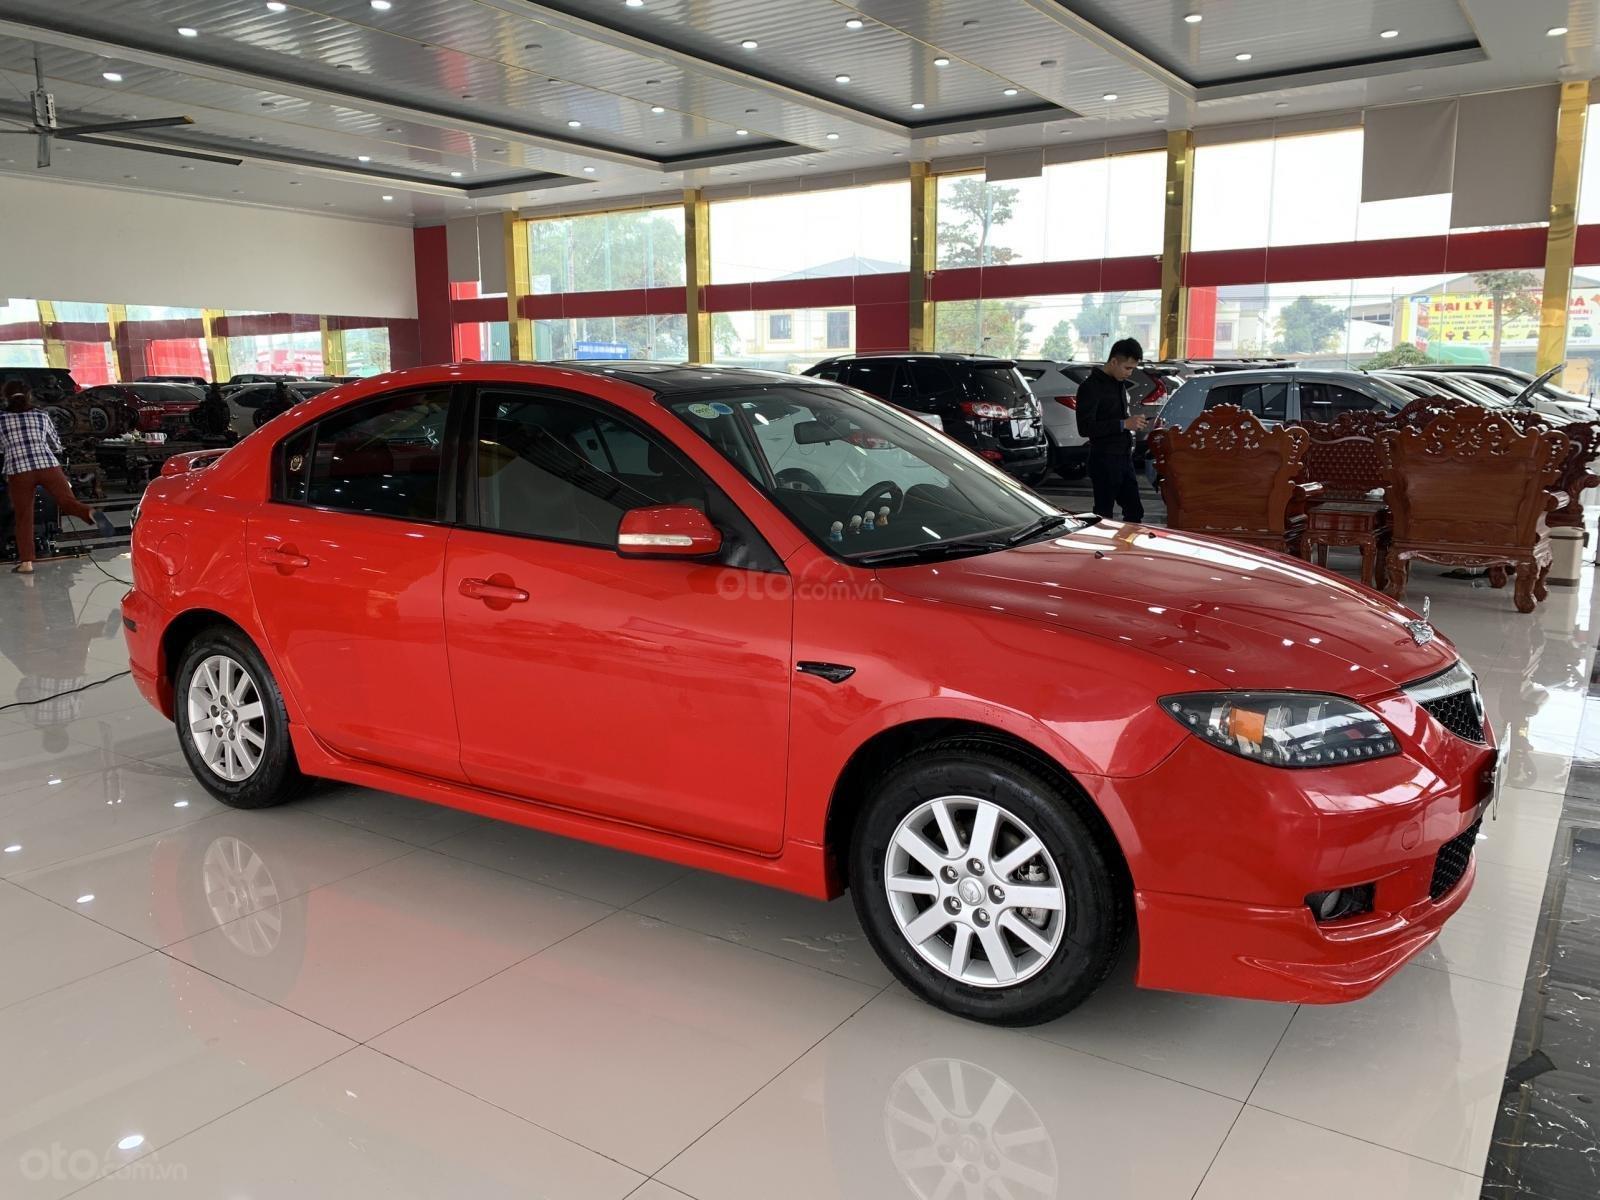 Bán Mazda 3 1.6 AT sản xuất 2009 (3)